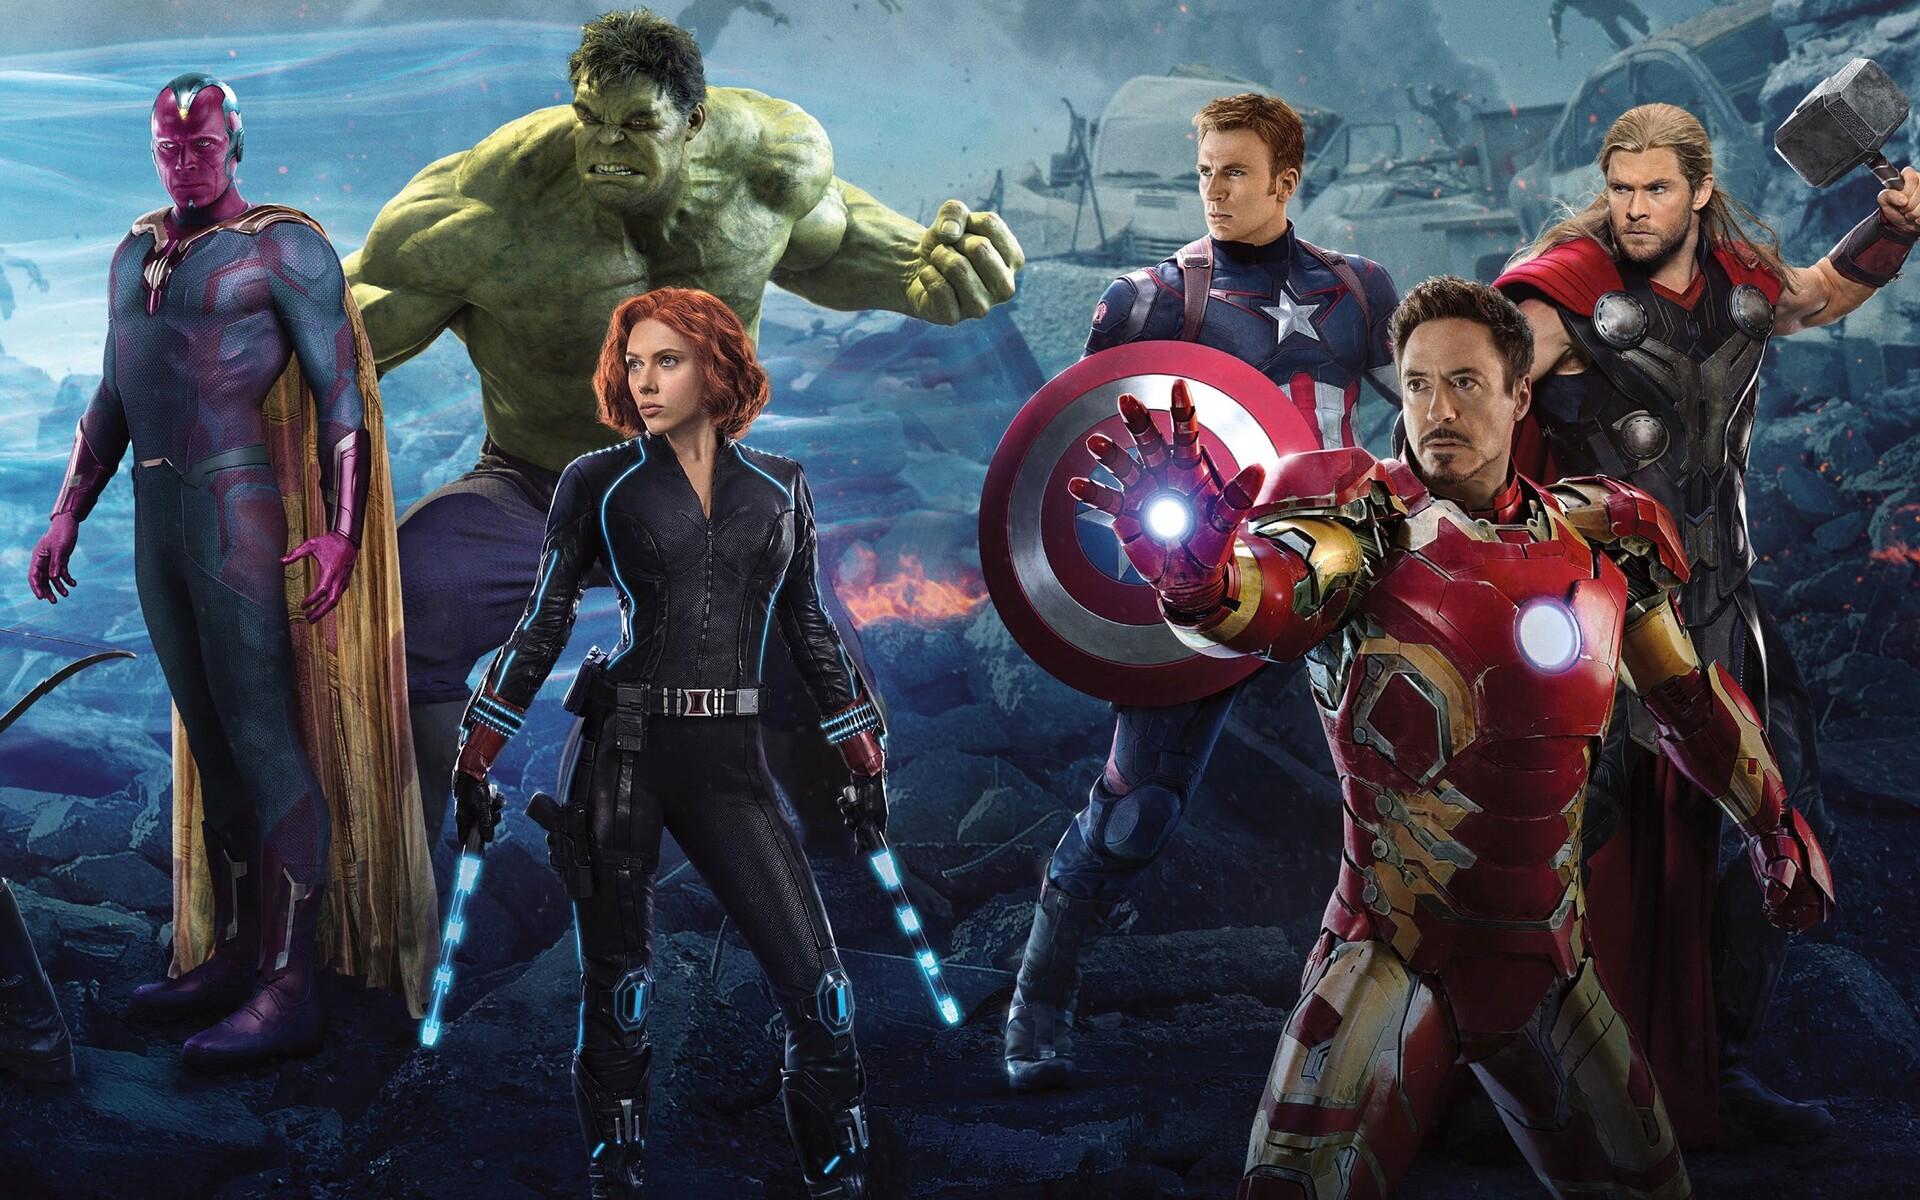 1920x1200 Avengers 2 1080P Resolution HD 4k Wallpapers ...